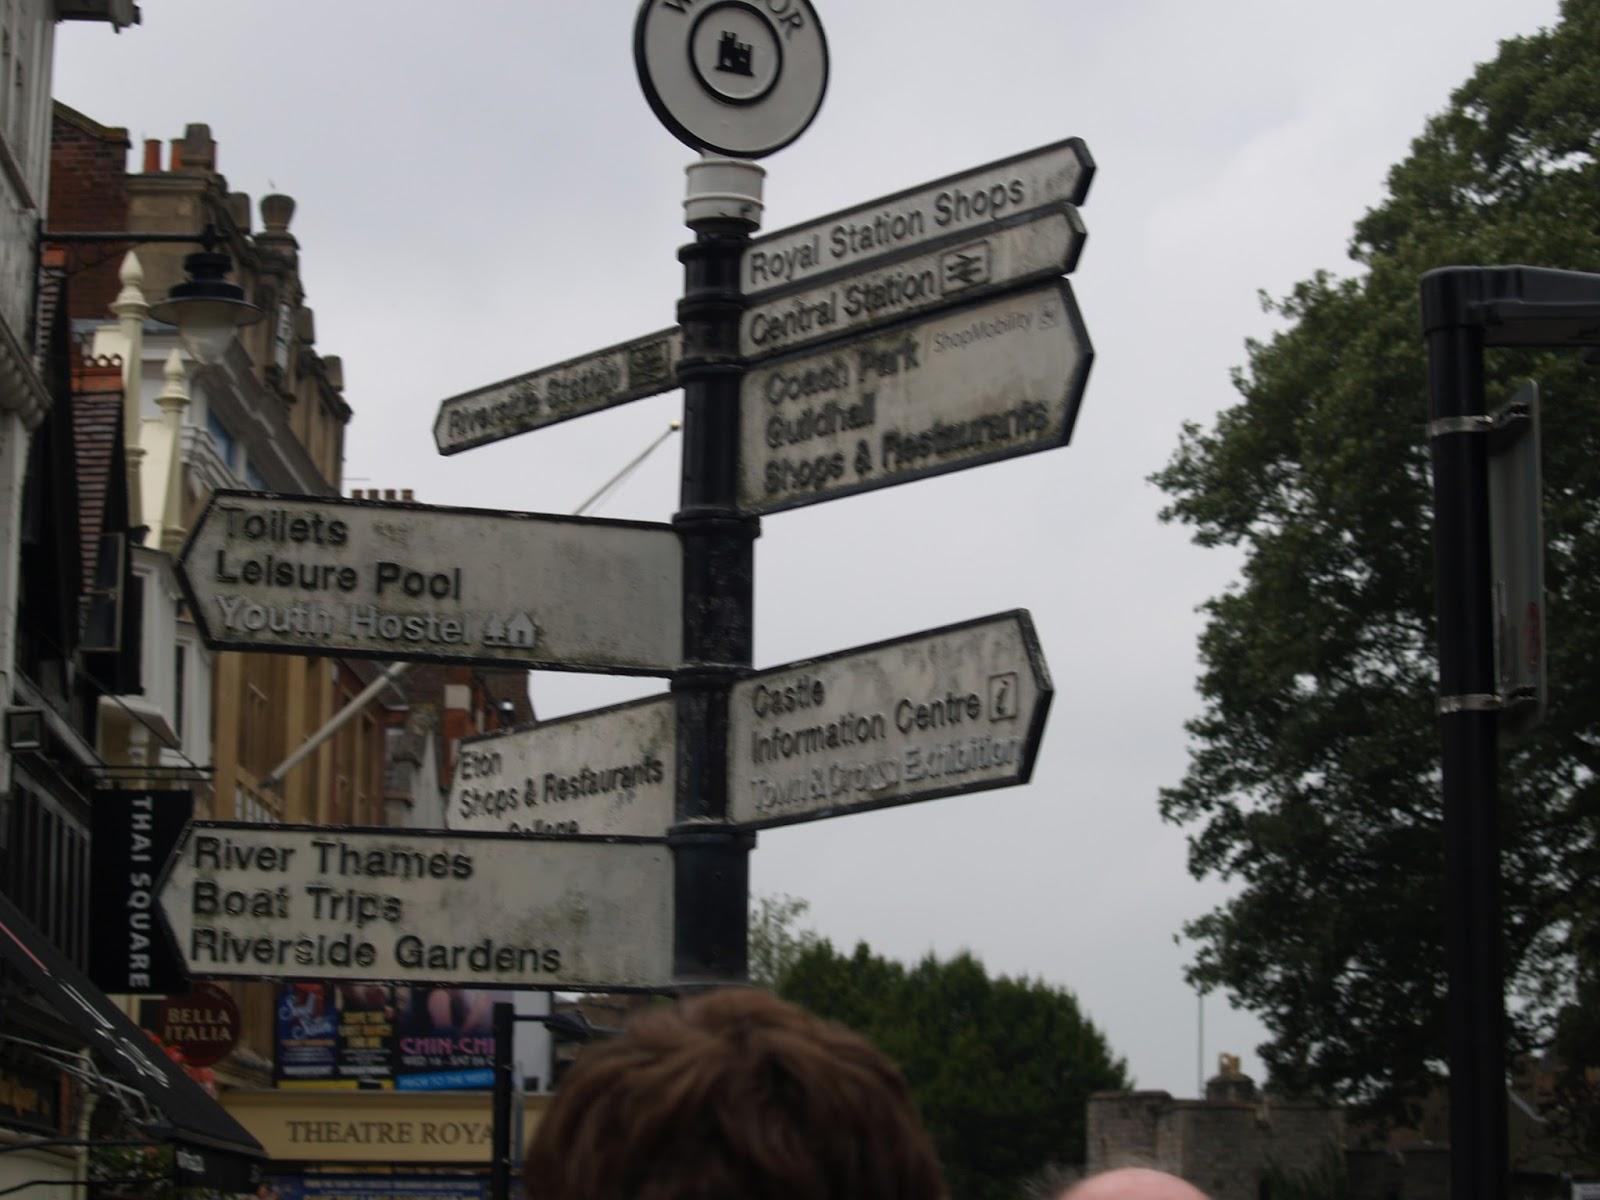 riverside trip Waterloo: 520 conestogo road, waterloo on ph: 519-578-3265 fx: 519-578-4402 london: 1275 hubrey road, london on ph: 519-686-7573 fx: 519-686-8044.